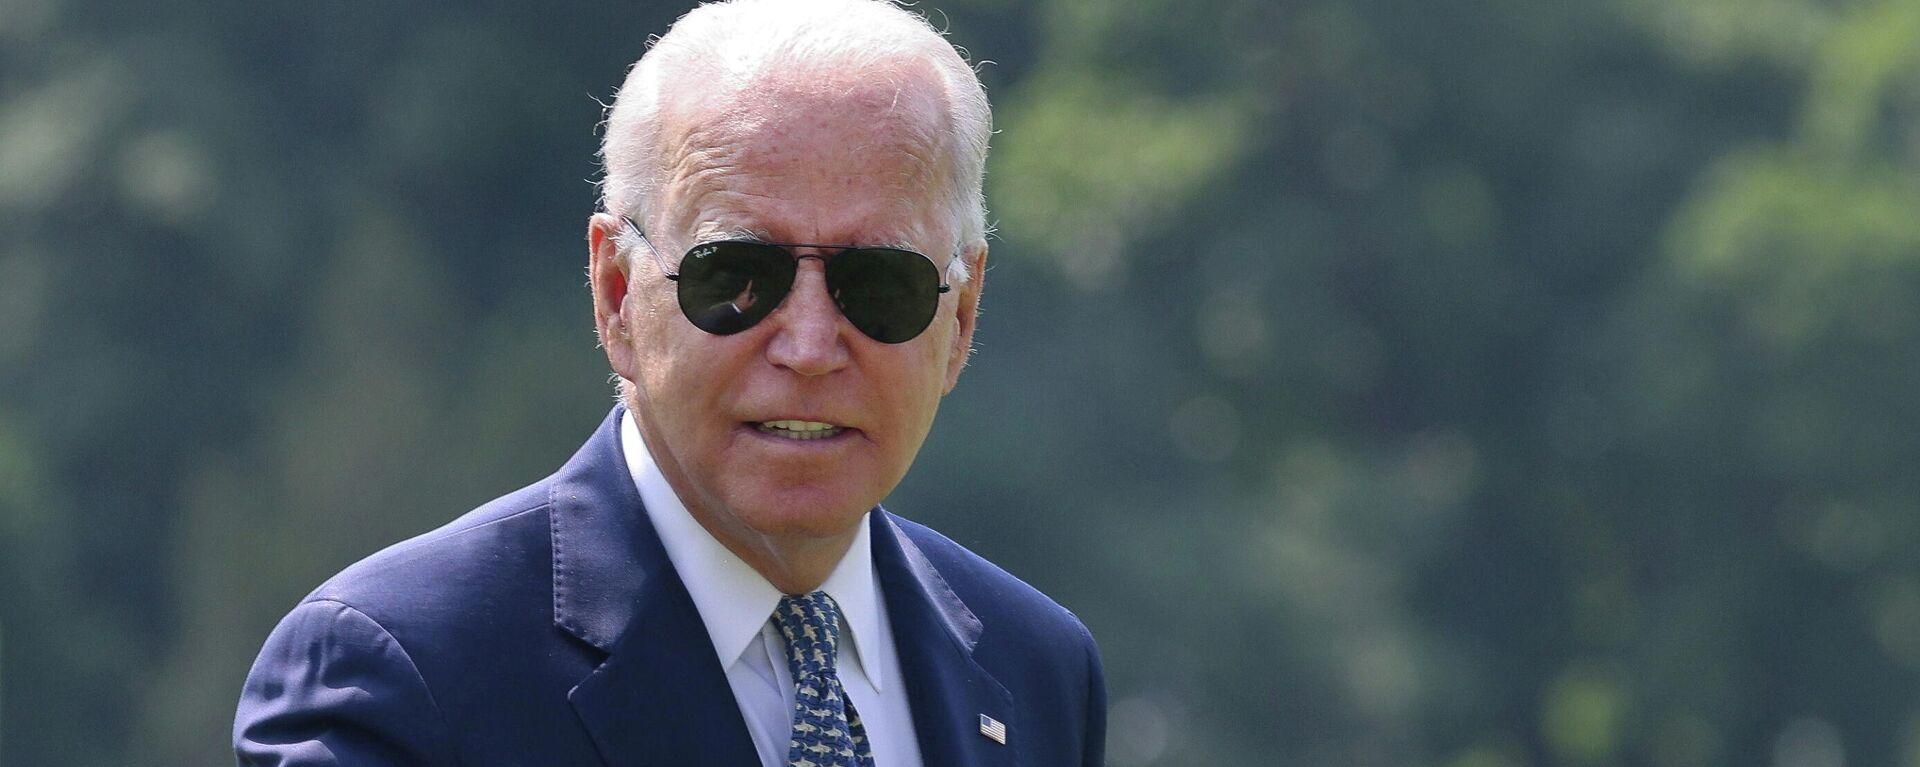 Joe Biden, presidente de EEUU - Sputnik Mundo, 1920, 16.08.2021